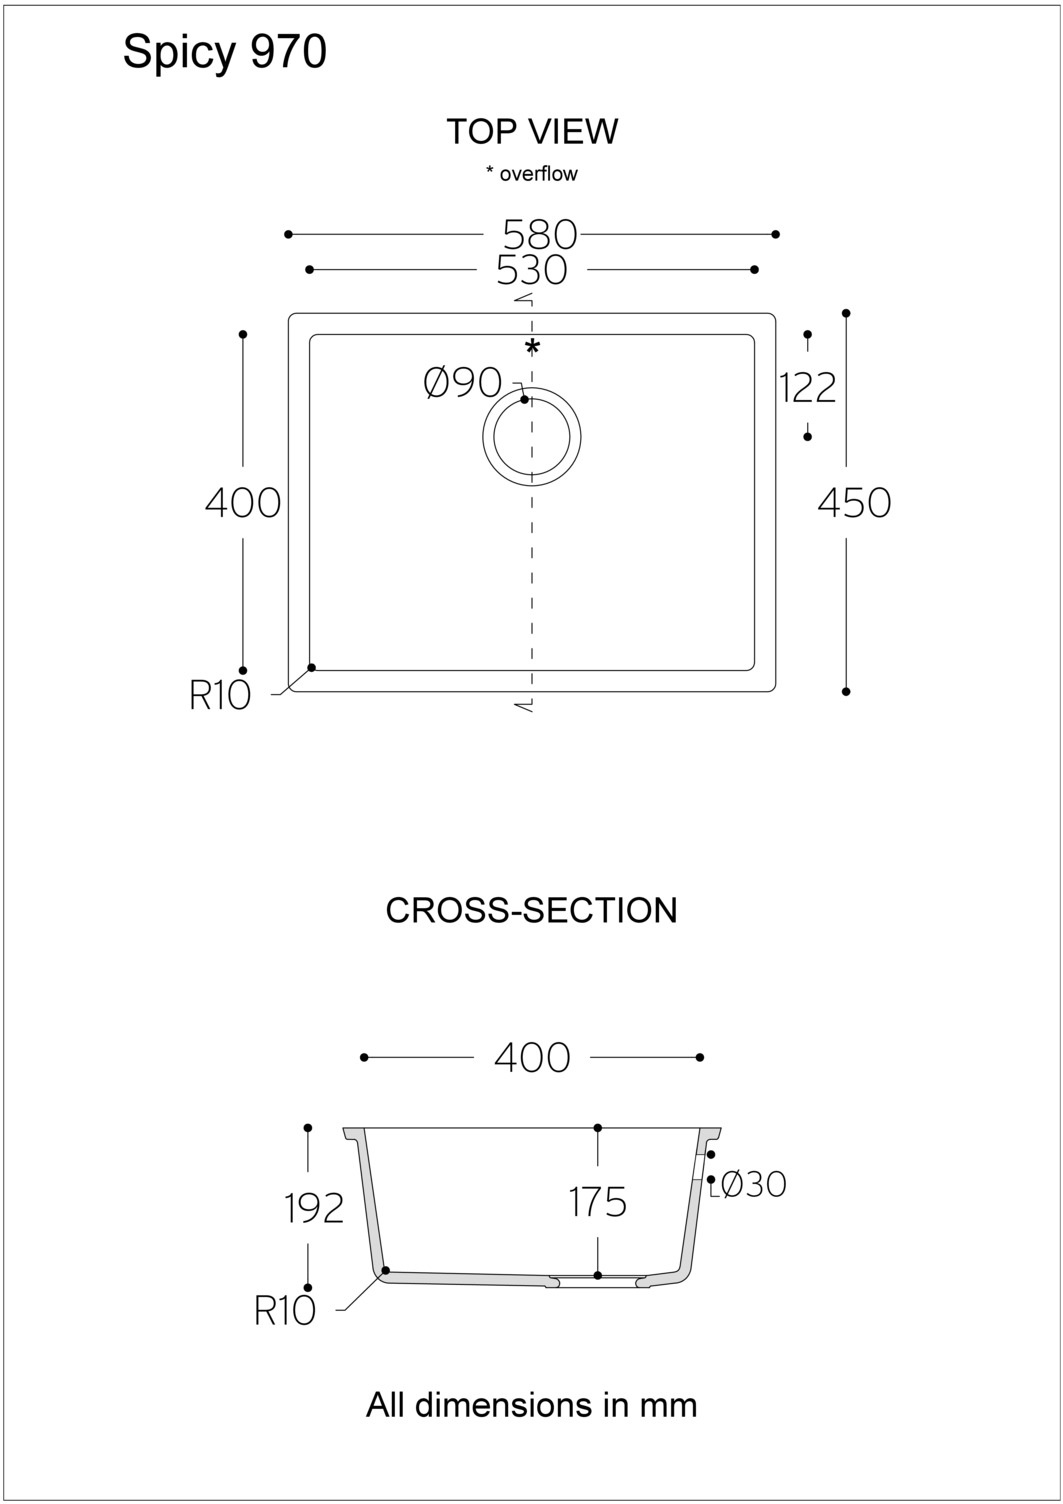 DUPONT_CORIAN_SPICY970_2D_PDF[0]